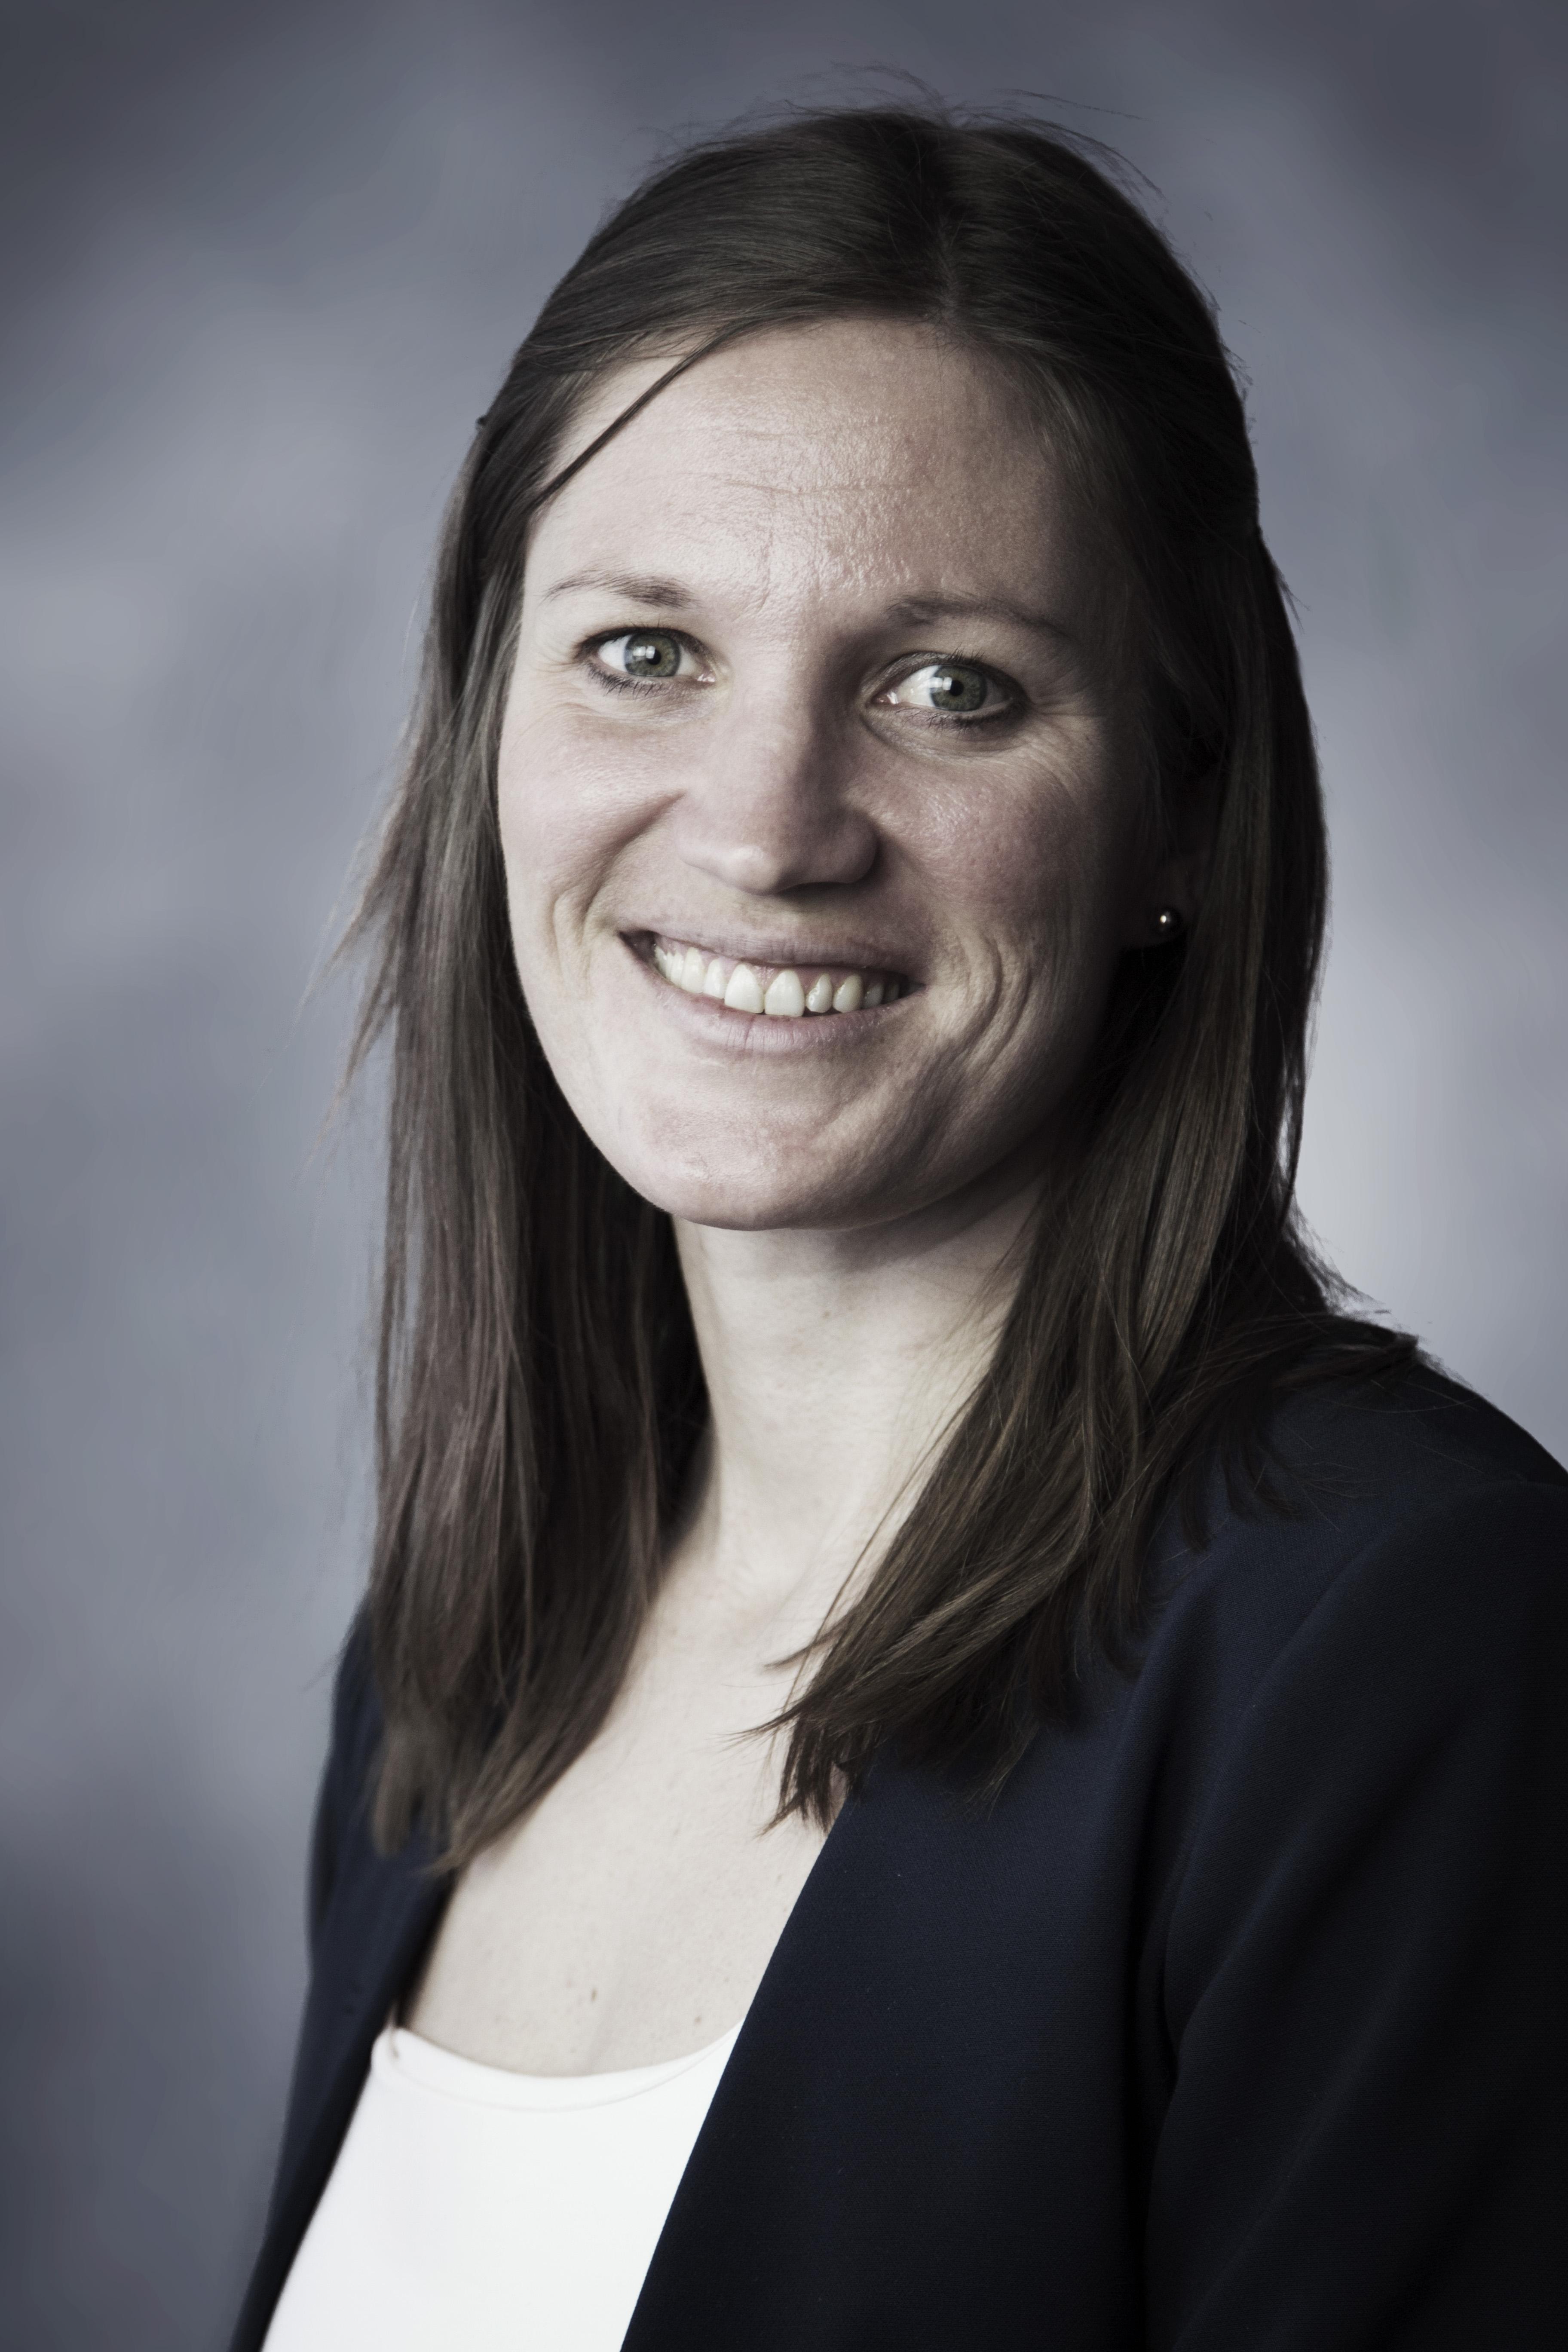 Marianne Svinsholt Smith